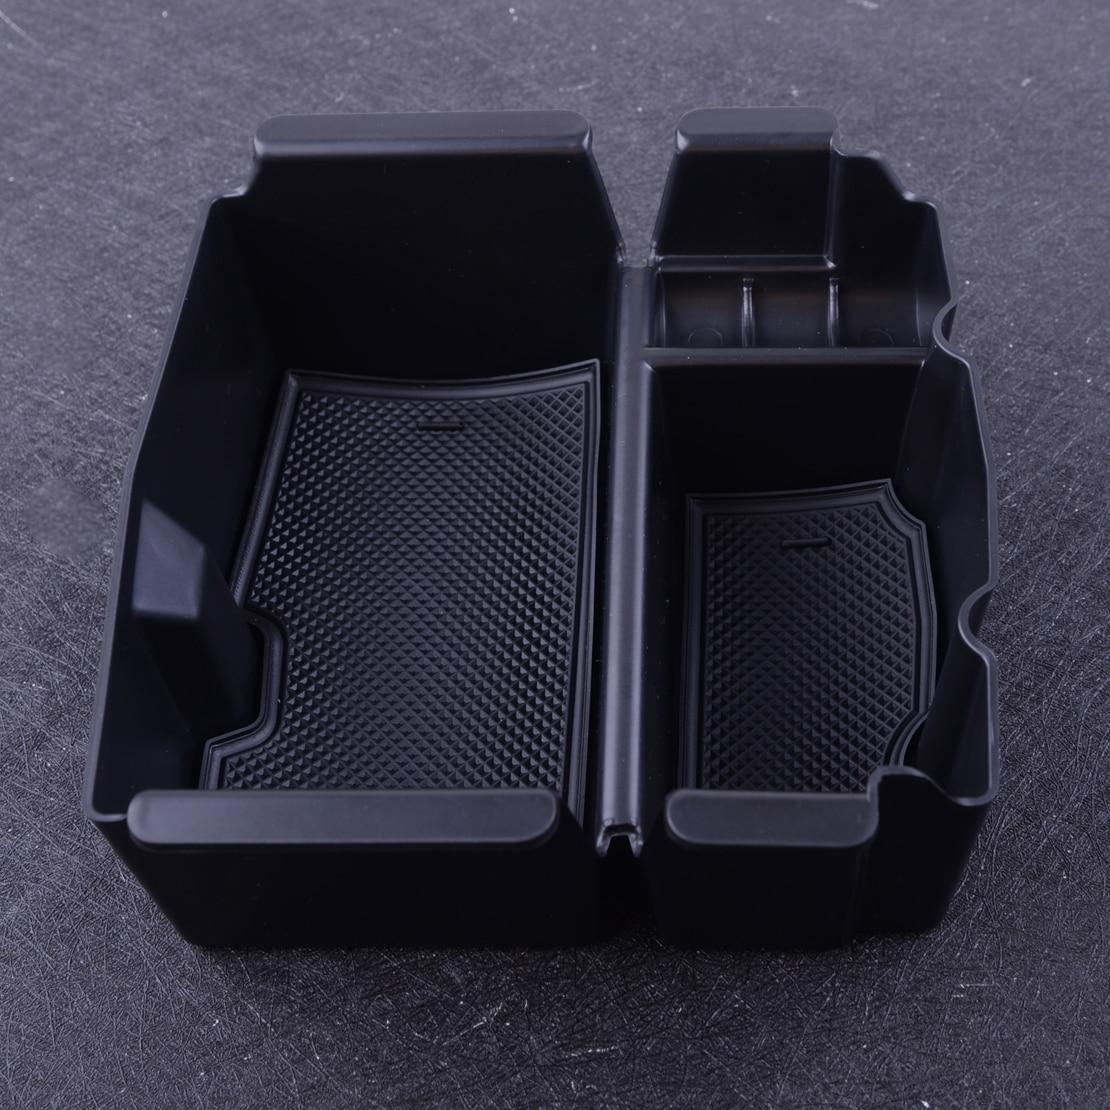 dwcx center console caixa de armazenamento apoio braco caso bandeja organizador recipiente apto para jeep wrangler